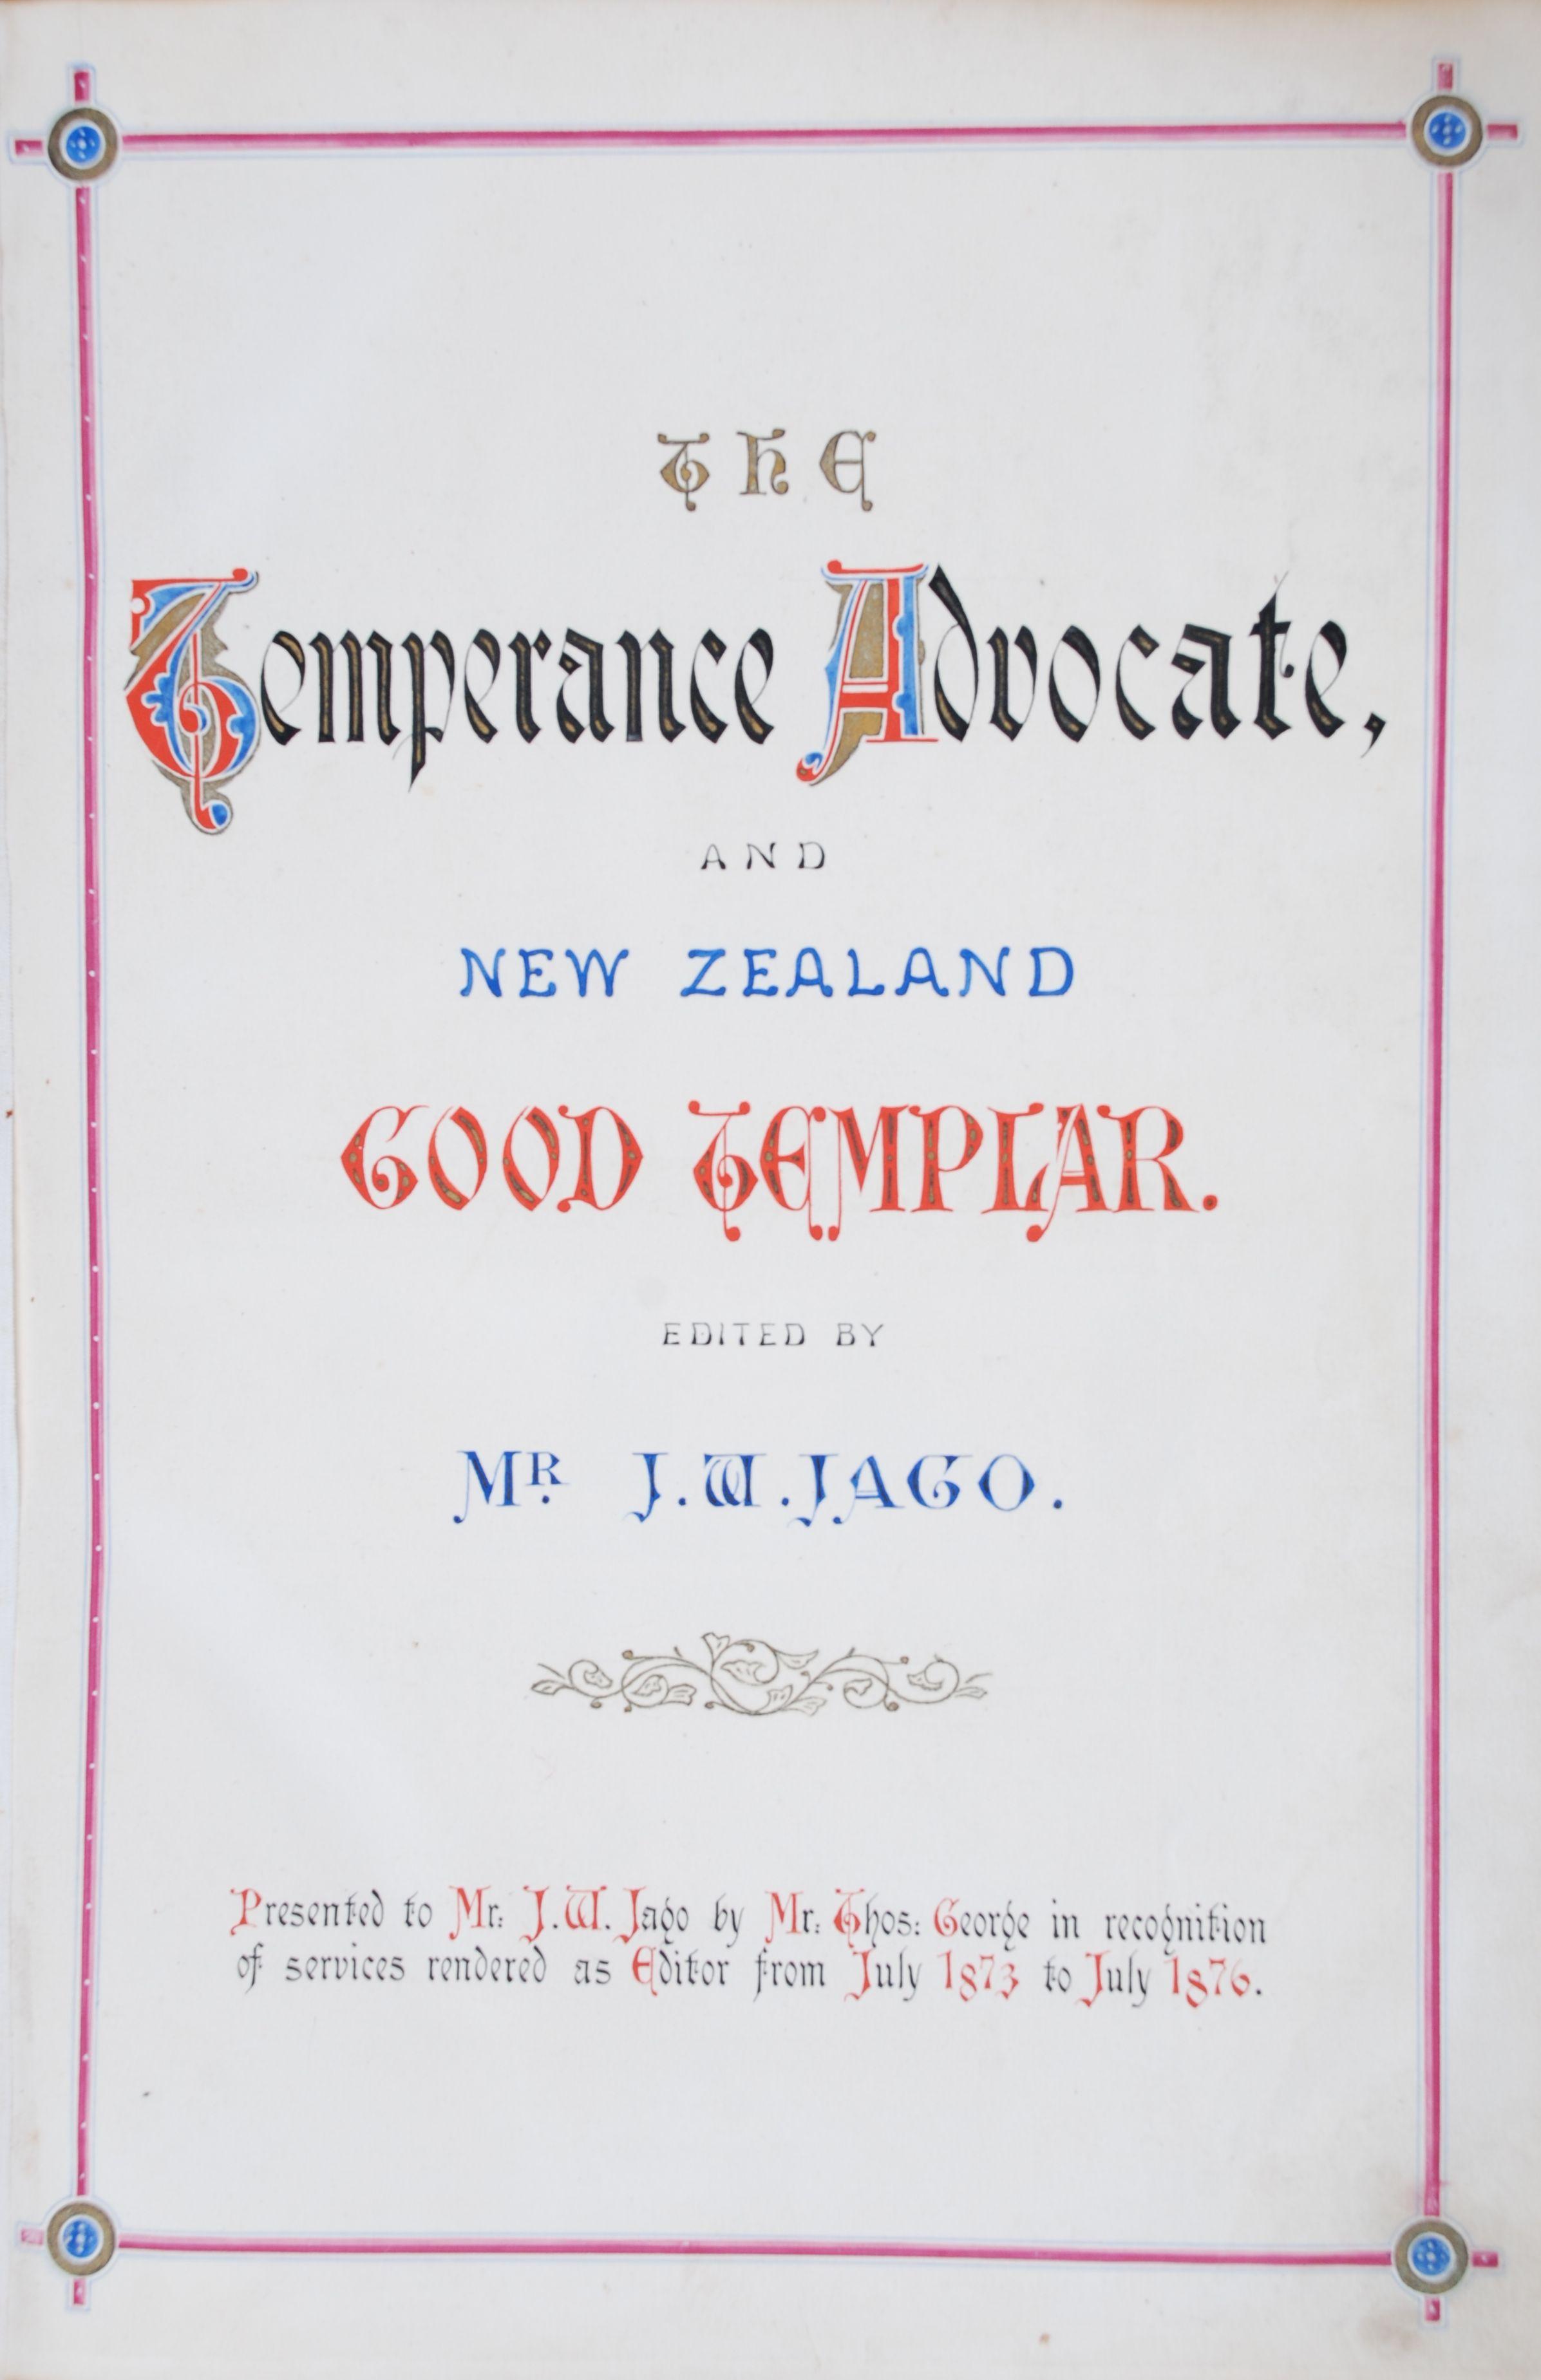 J. W. Jago, editor. The Temperance Advocate and New Zealand Good Templar. Vol. 1, no. 1 –vol. 3, no. 12. (1 July 1873 – 1 Jun 1876) Dunedin: T. George and J. B. McCulloch.